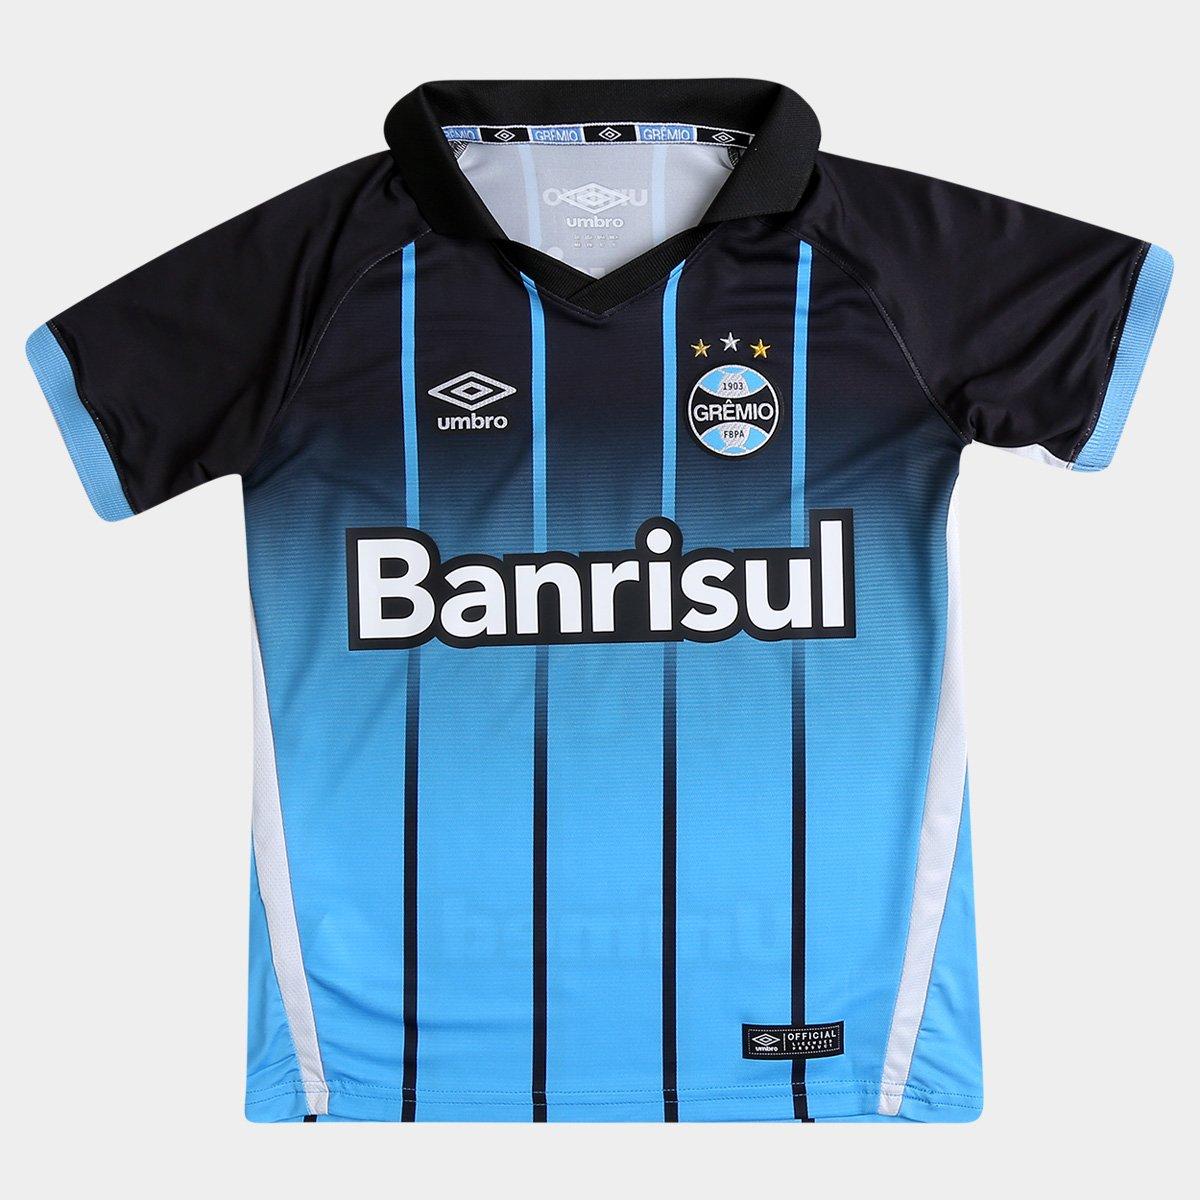 8bb73b16a Camisa Umbro Grêmio III 2016 s nº Juvenil - Compre Agora